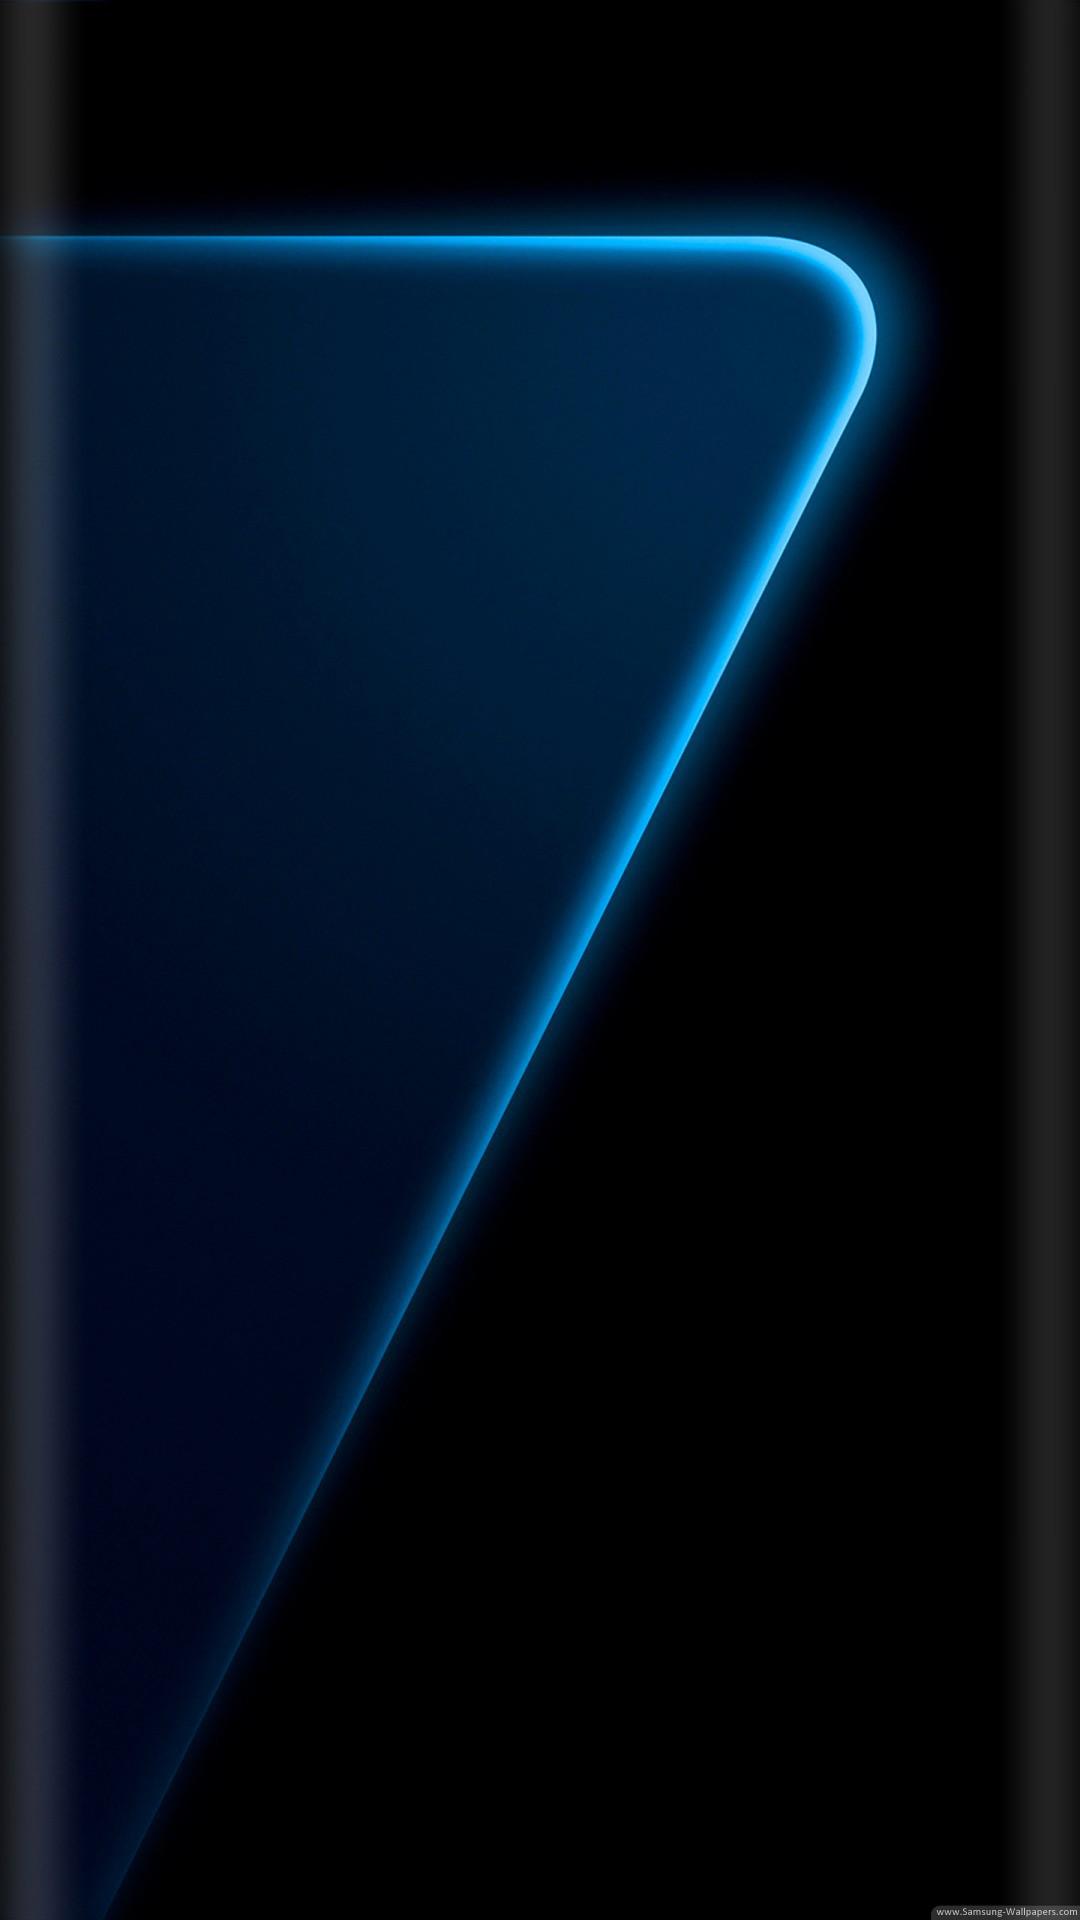 Samsung S7 Wallpapers Lock Screen Samsung S8 1080x1920 Download Hd Wallpaper Wallpapertip